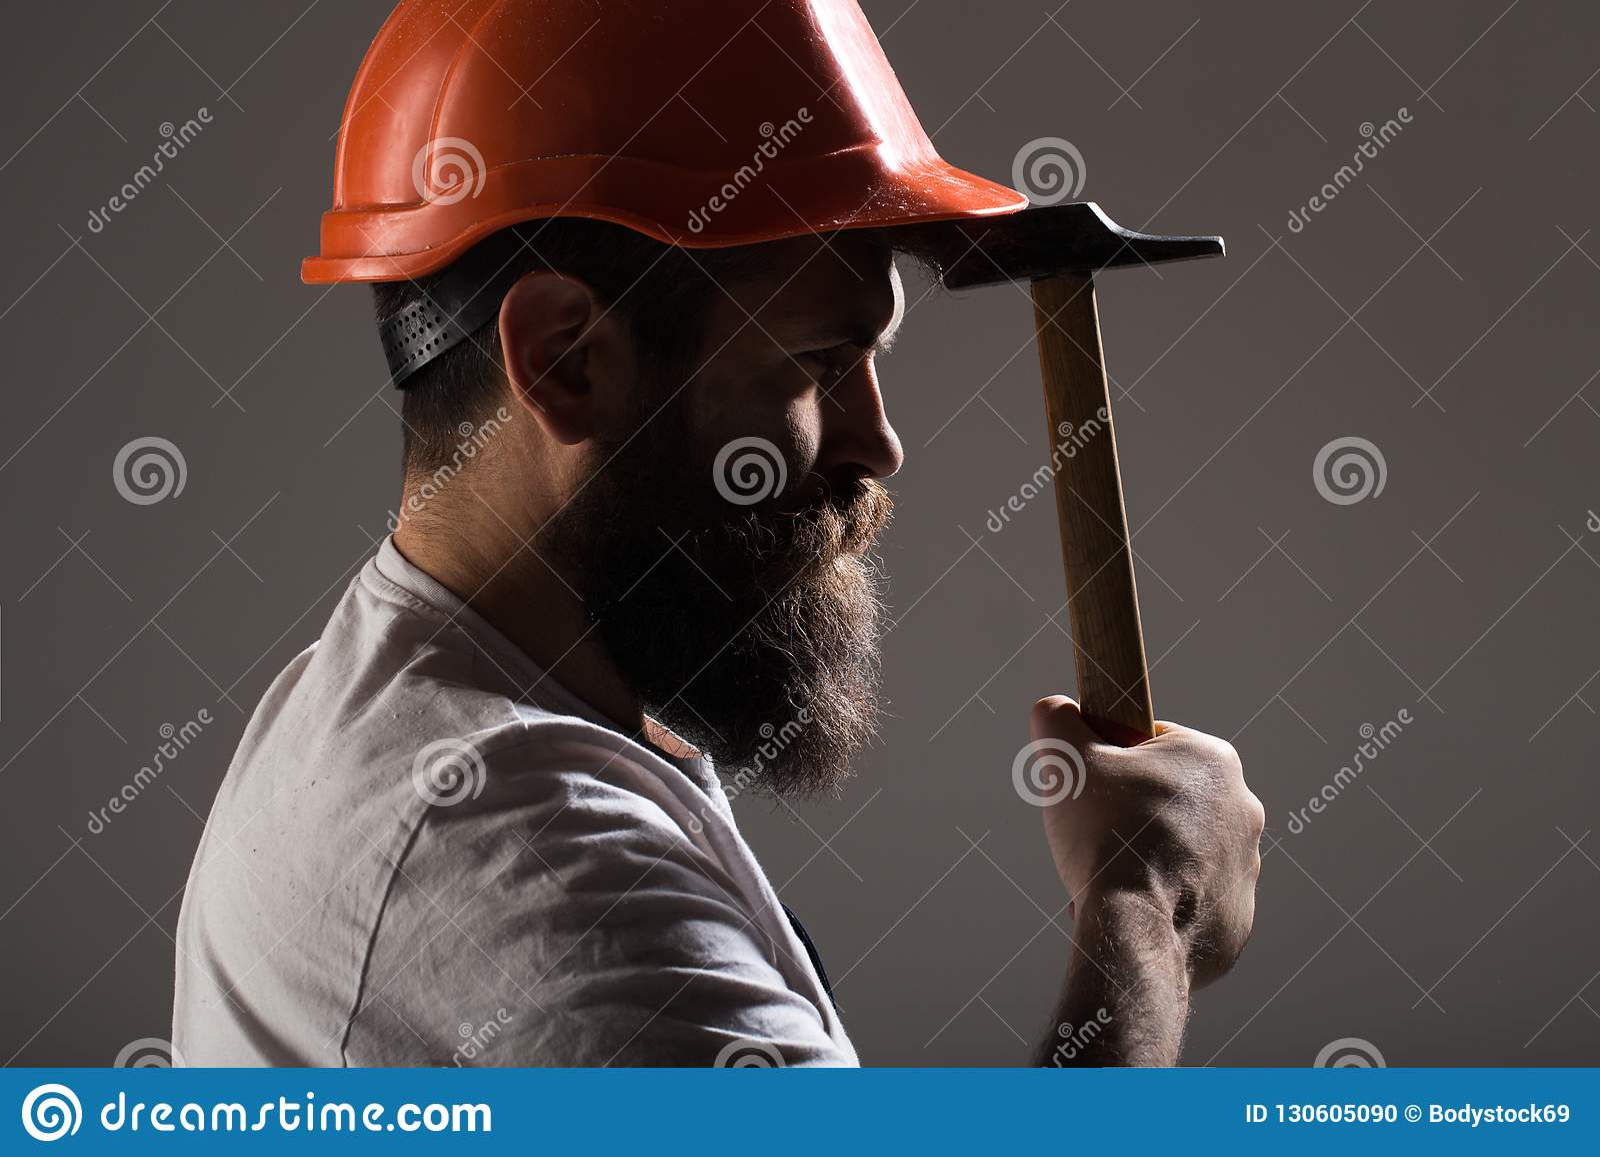 Builder in helmet, hammer, handyman, builders in hardhat. Bearded man worker with beard, building helmet, hard hat